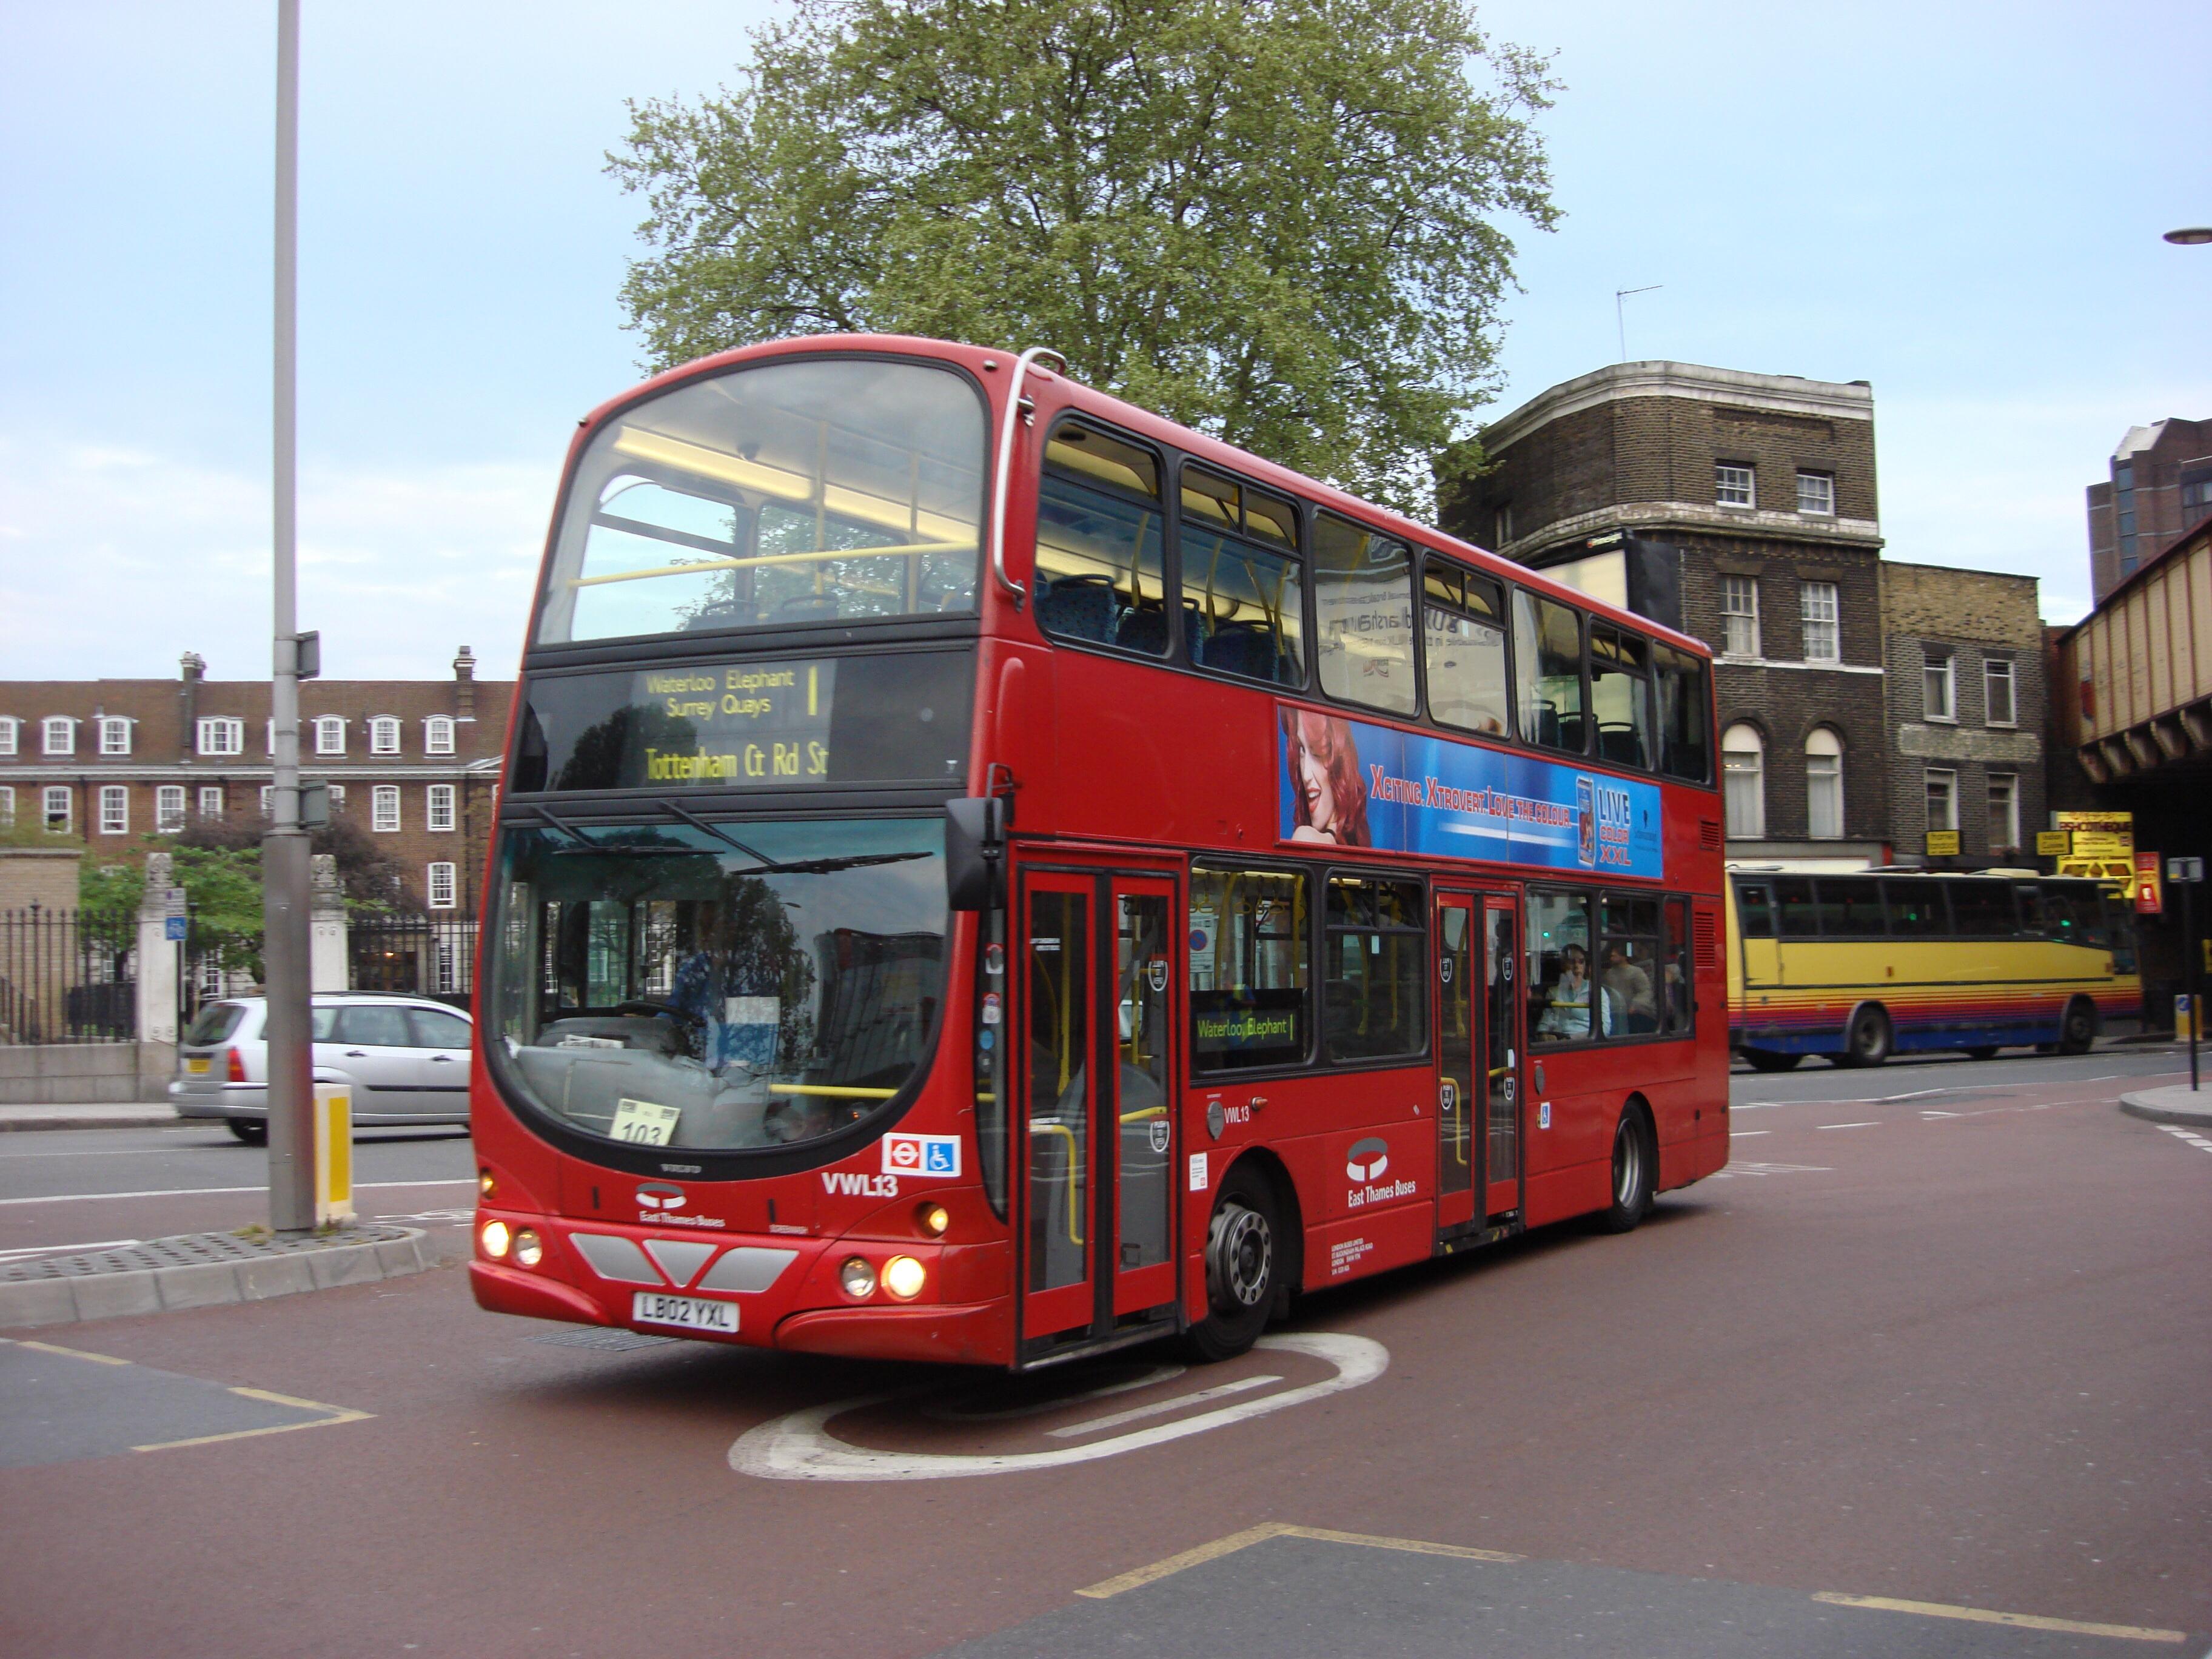 Double Decker Bus Tour From Heathrow